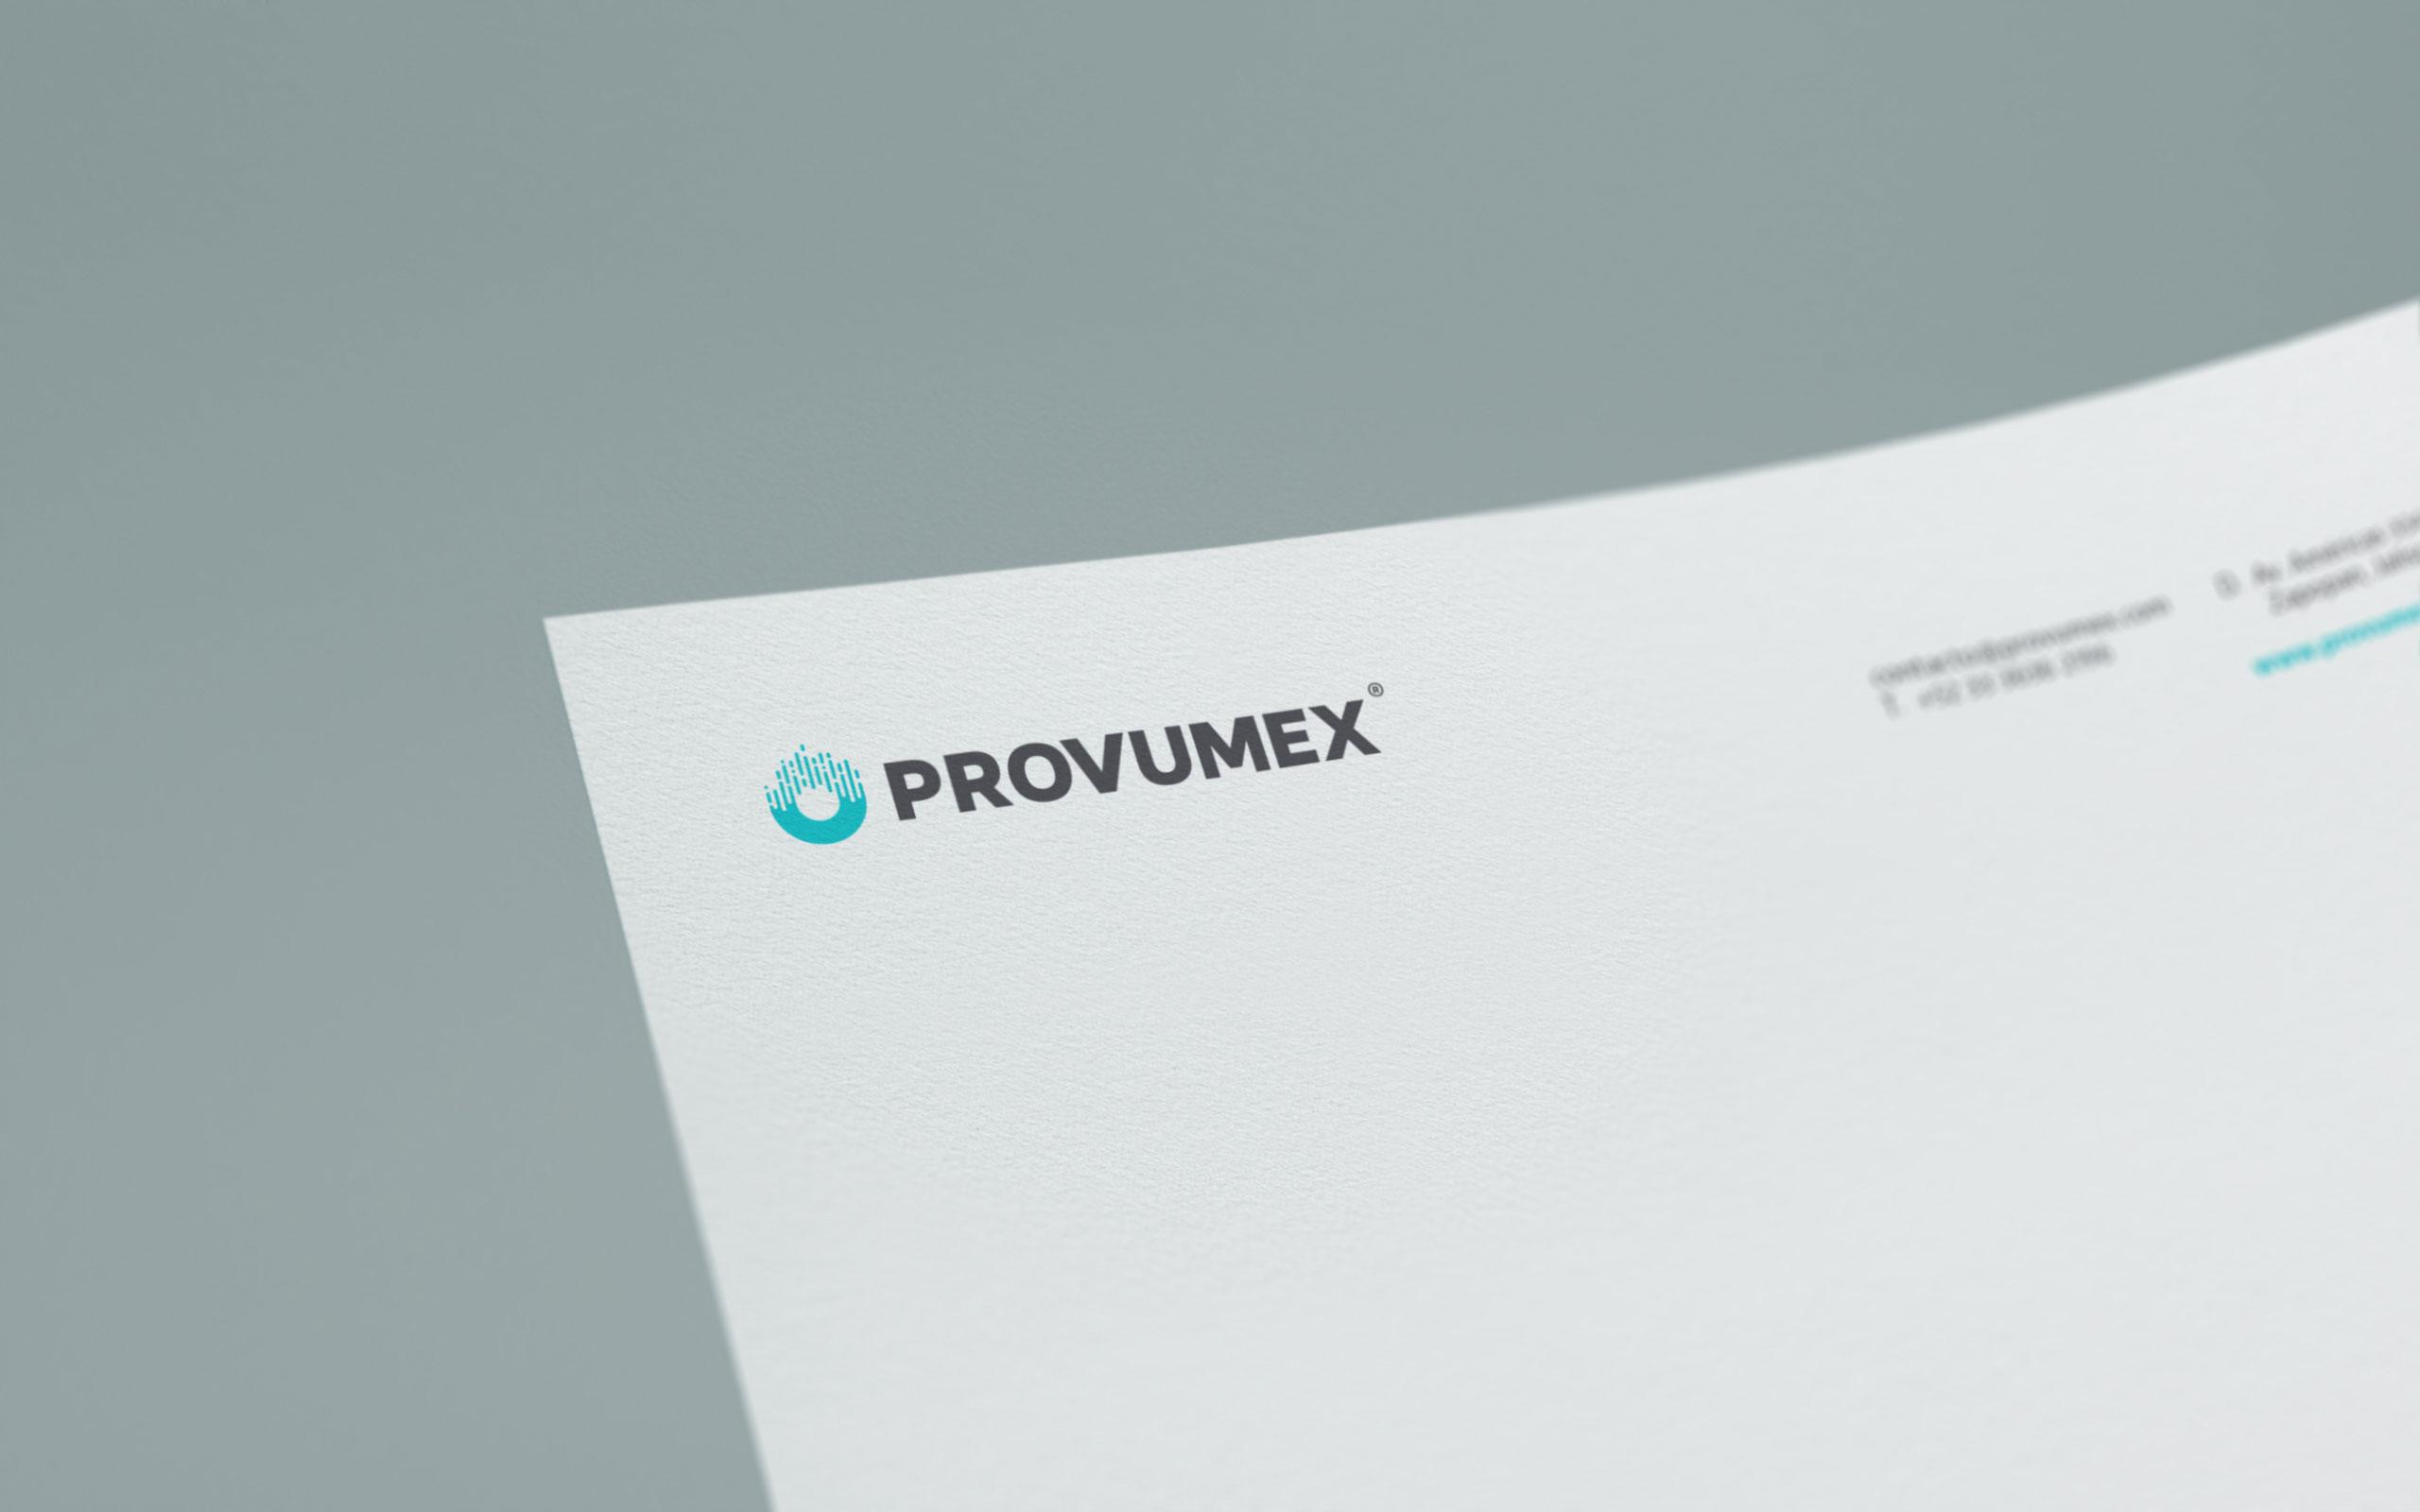 Provumex-013